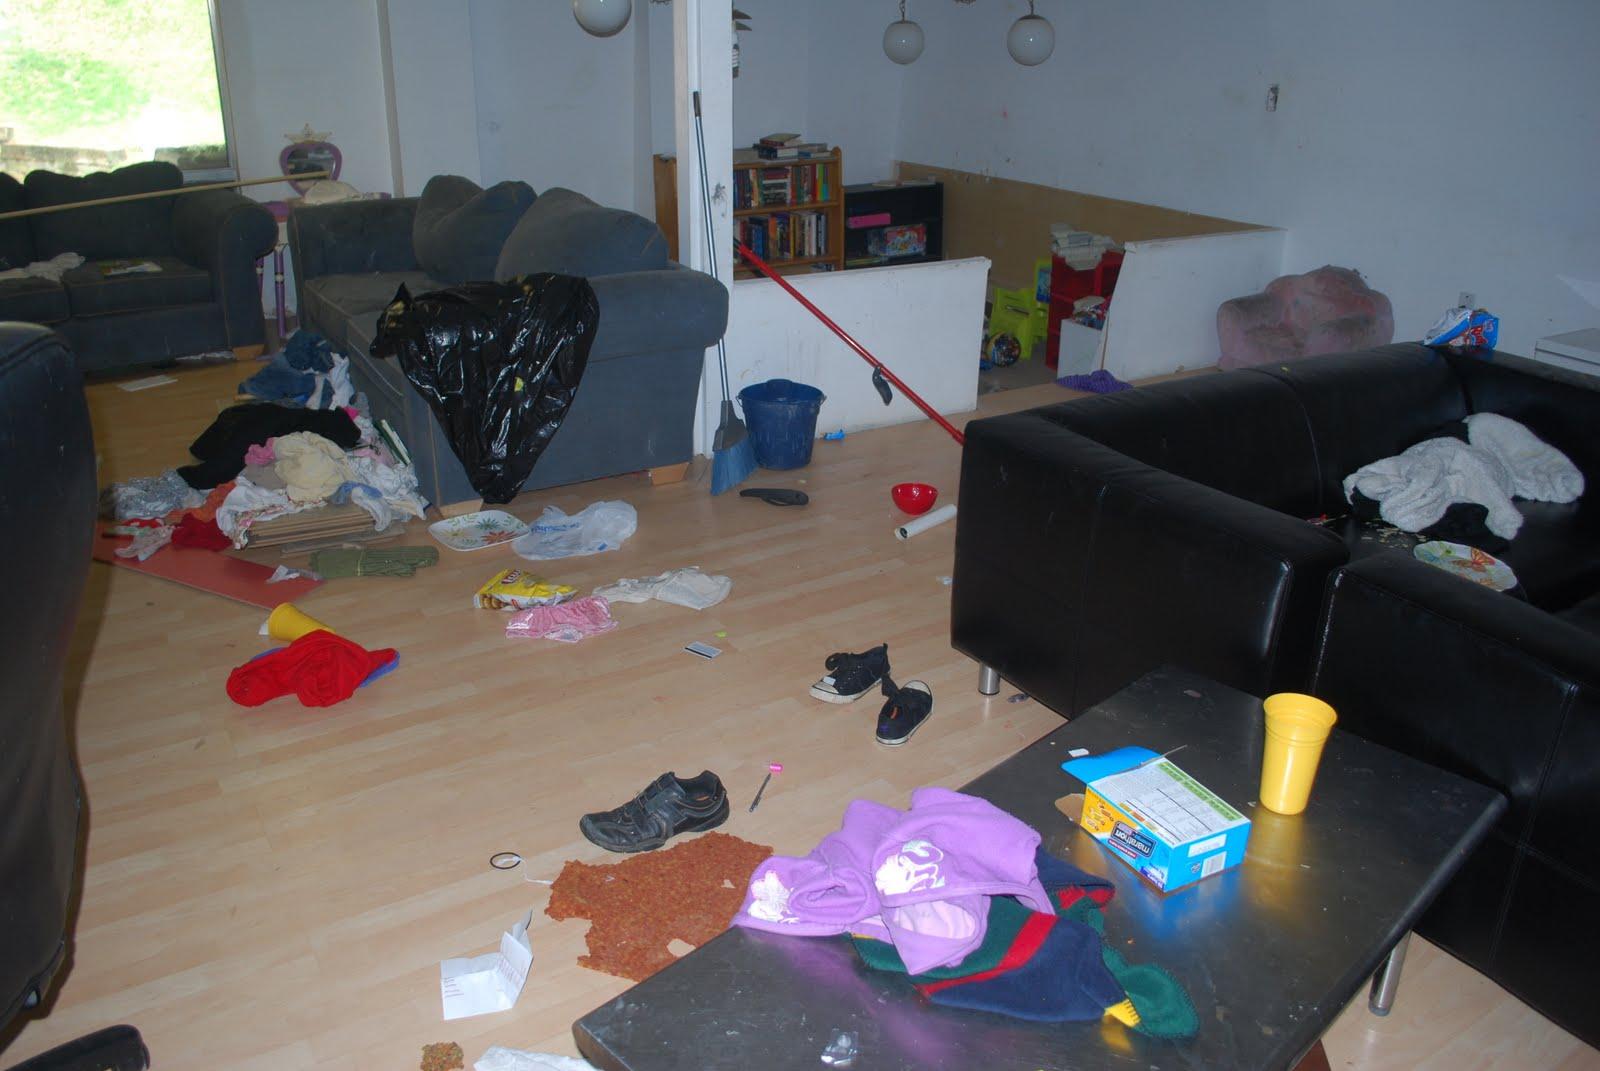 Chris crime scene photos benoit